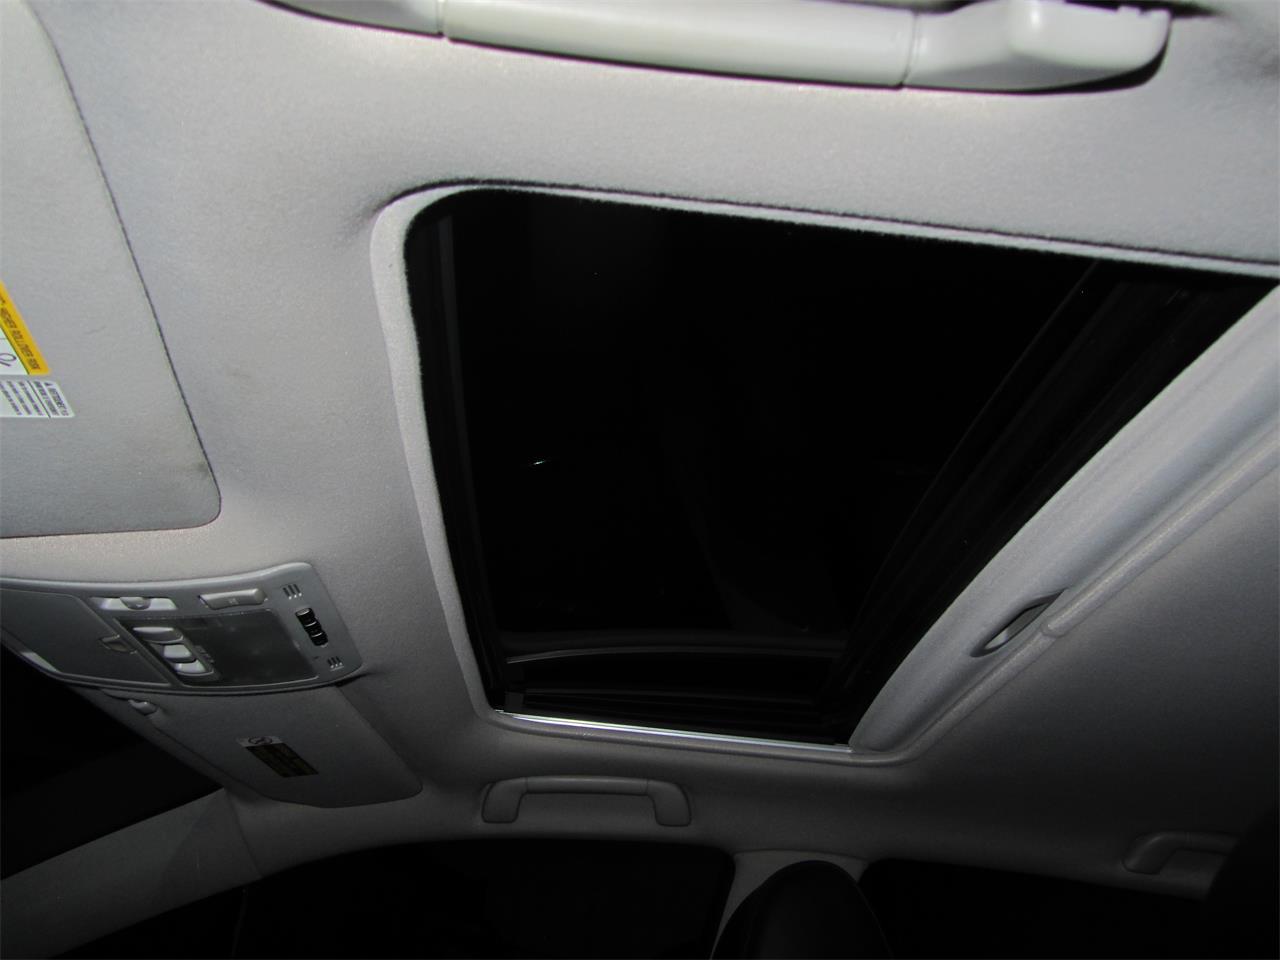 Large Picture of '05 Lexus RX330 located in Omaha Nebraska - $14,900.00 - NE2J